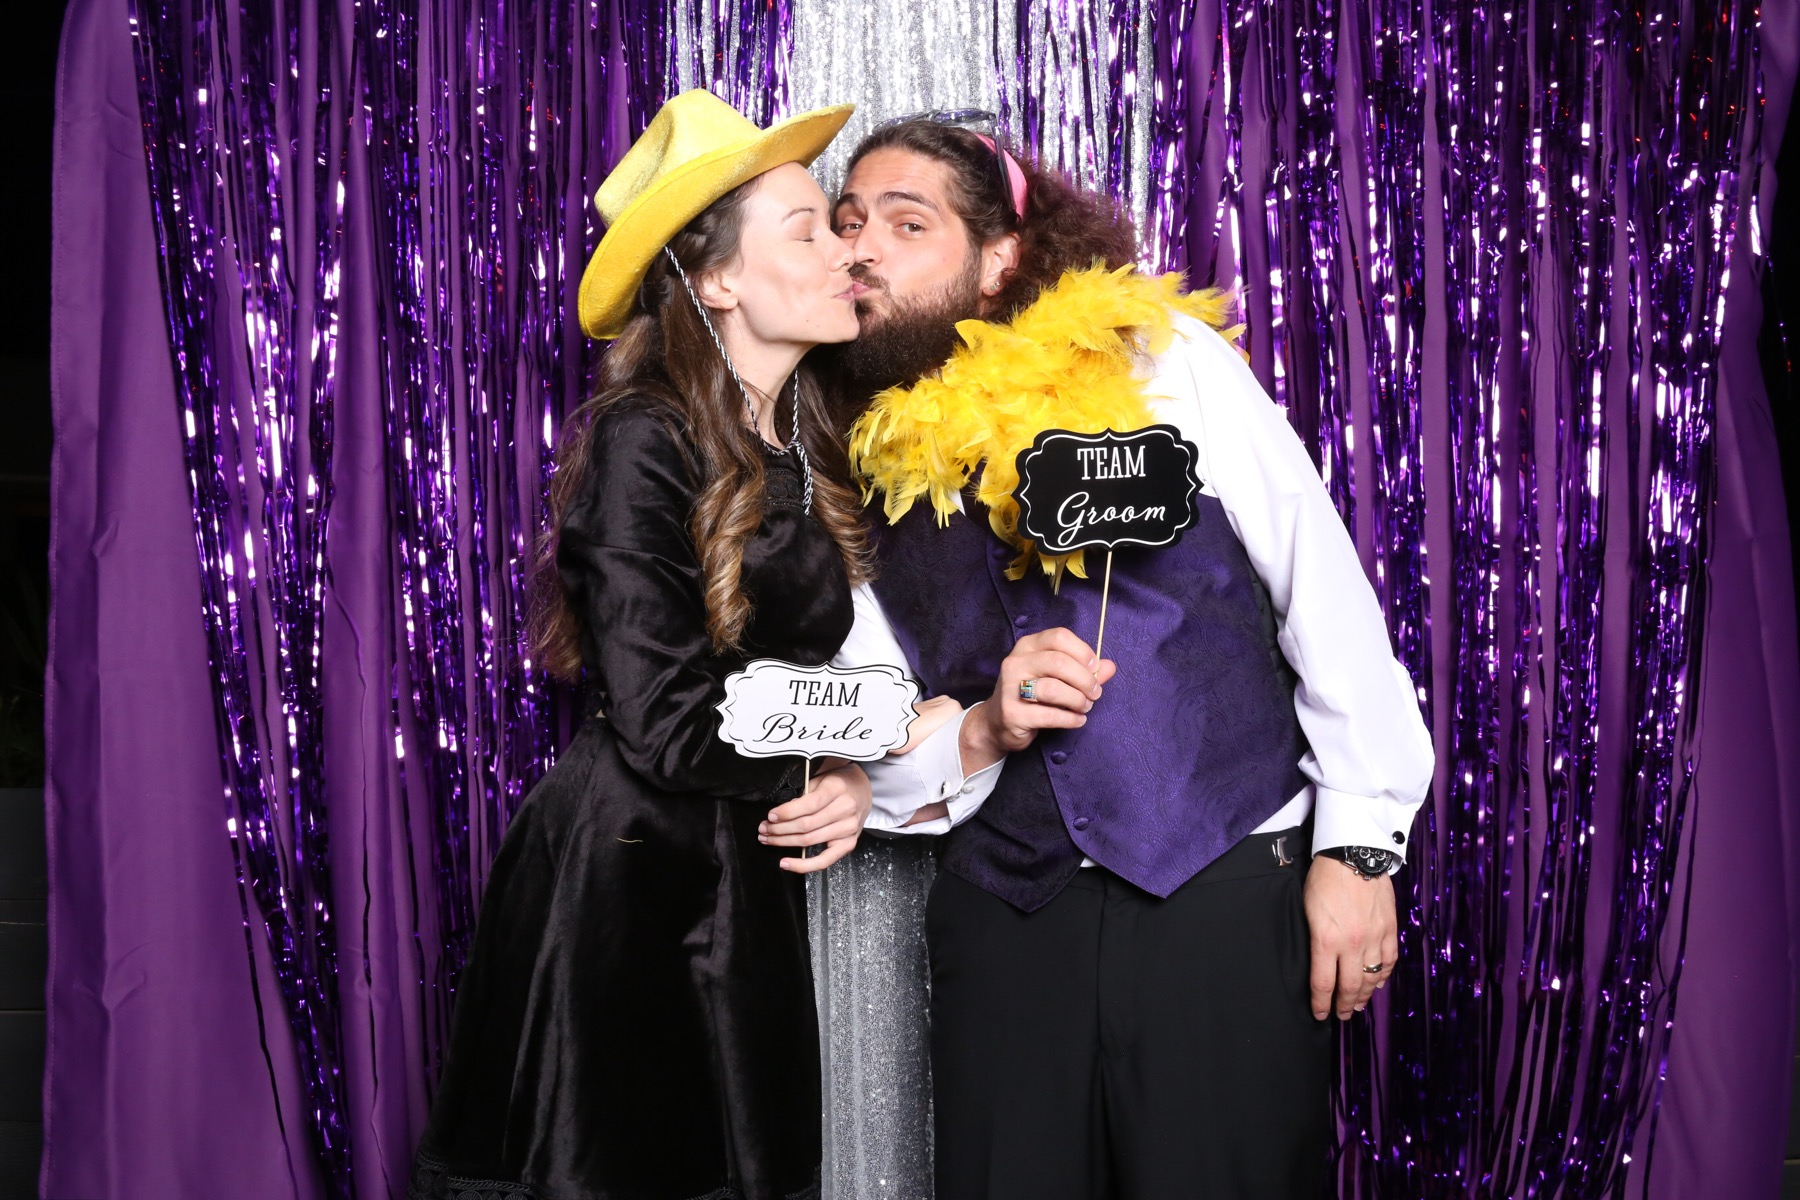 Booth Chamber Photo Booth Harmony Gardens wedding antoine Hart de leon springs photography_50.jpeg